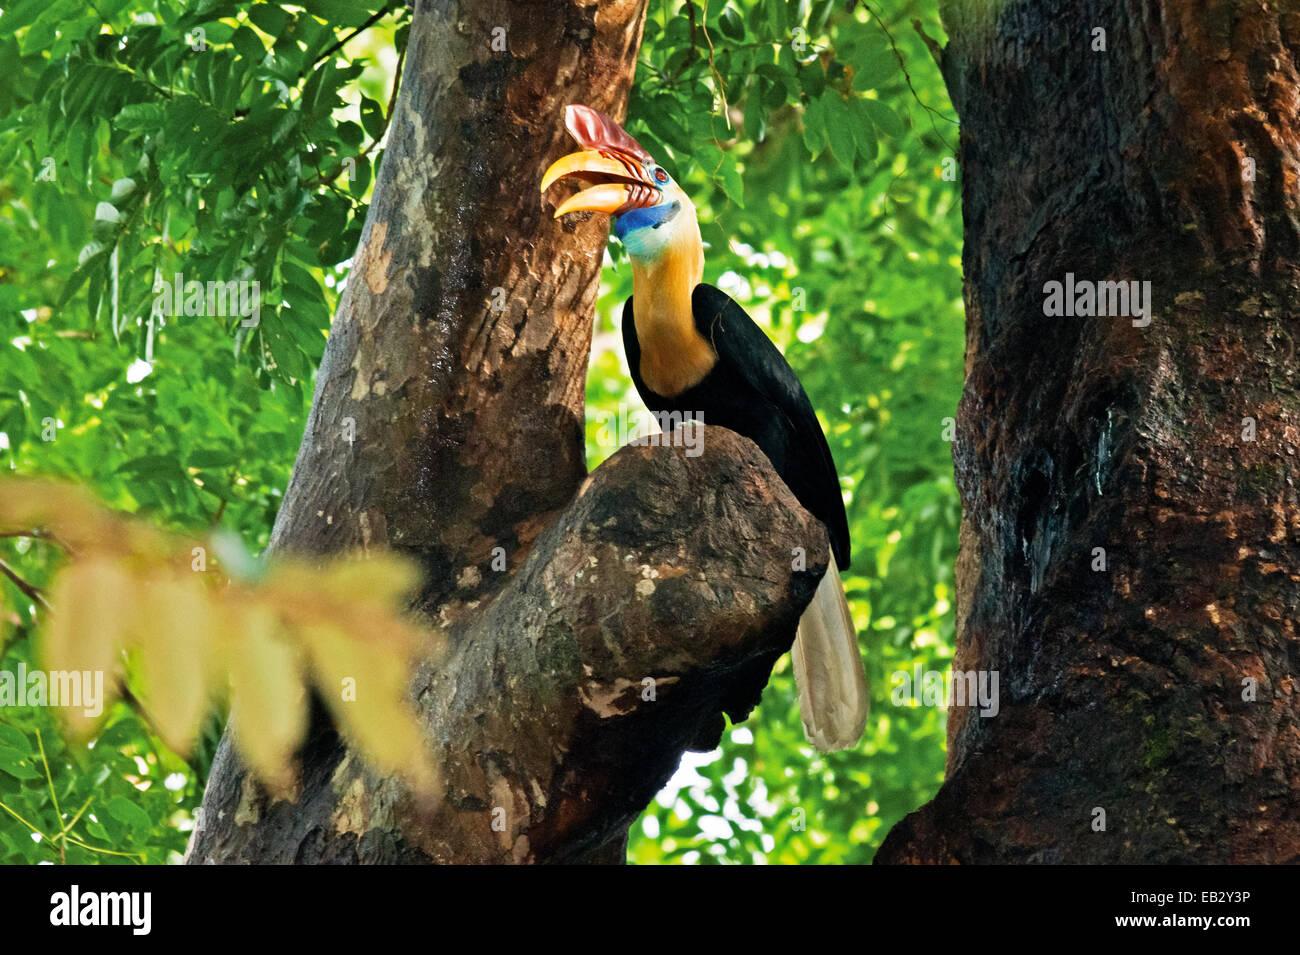 Sulawesi red-knobbed hornbill in Tangkoko Duasudara nature reserve. © Reynold Sumayku - Stock Image